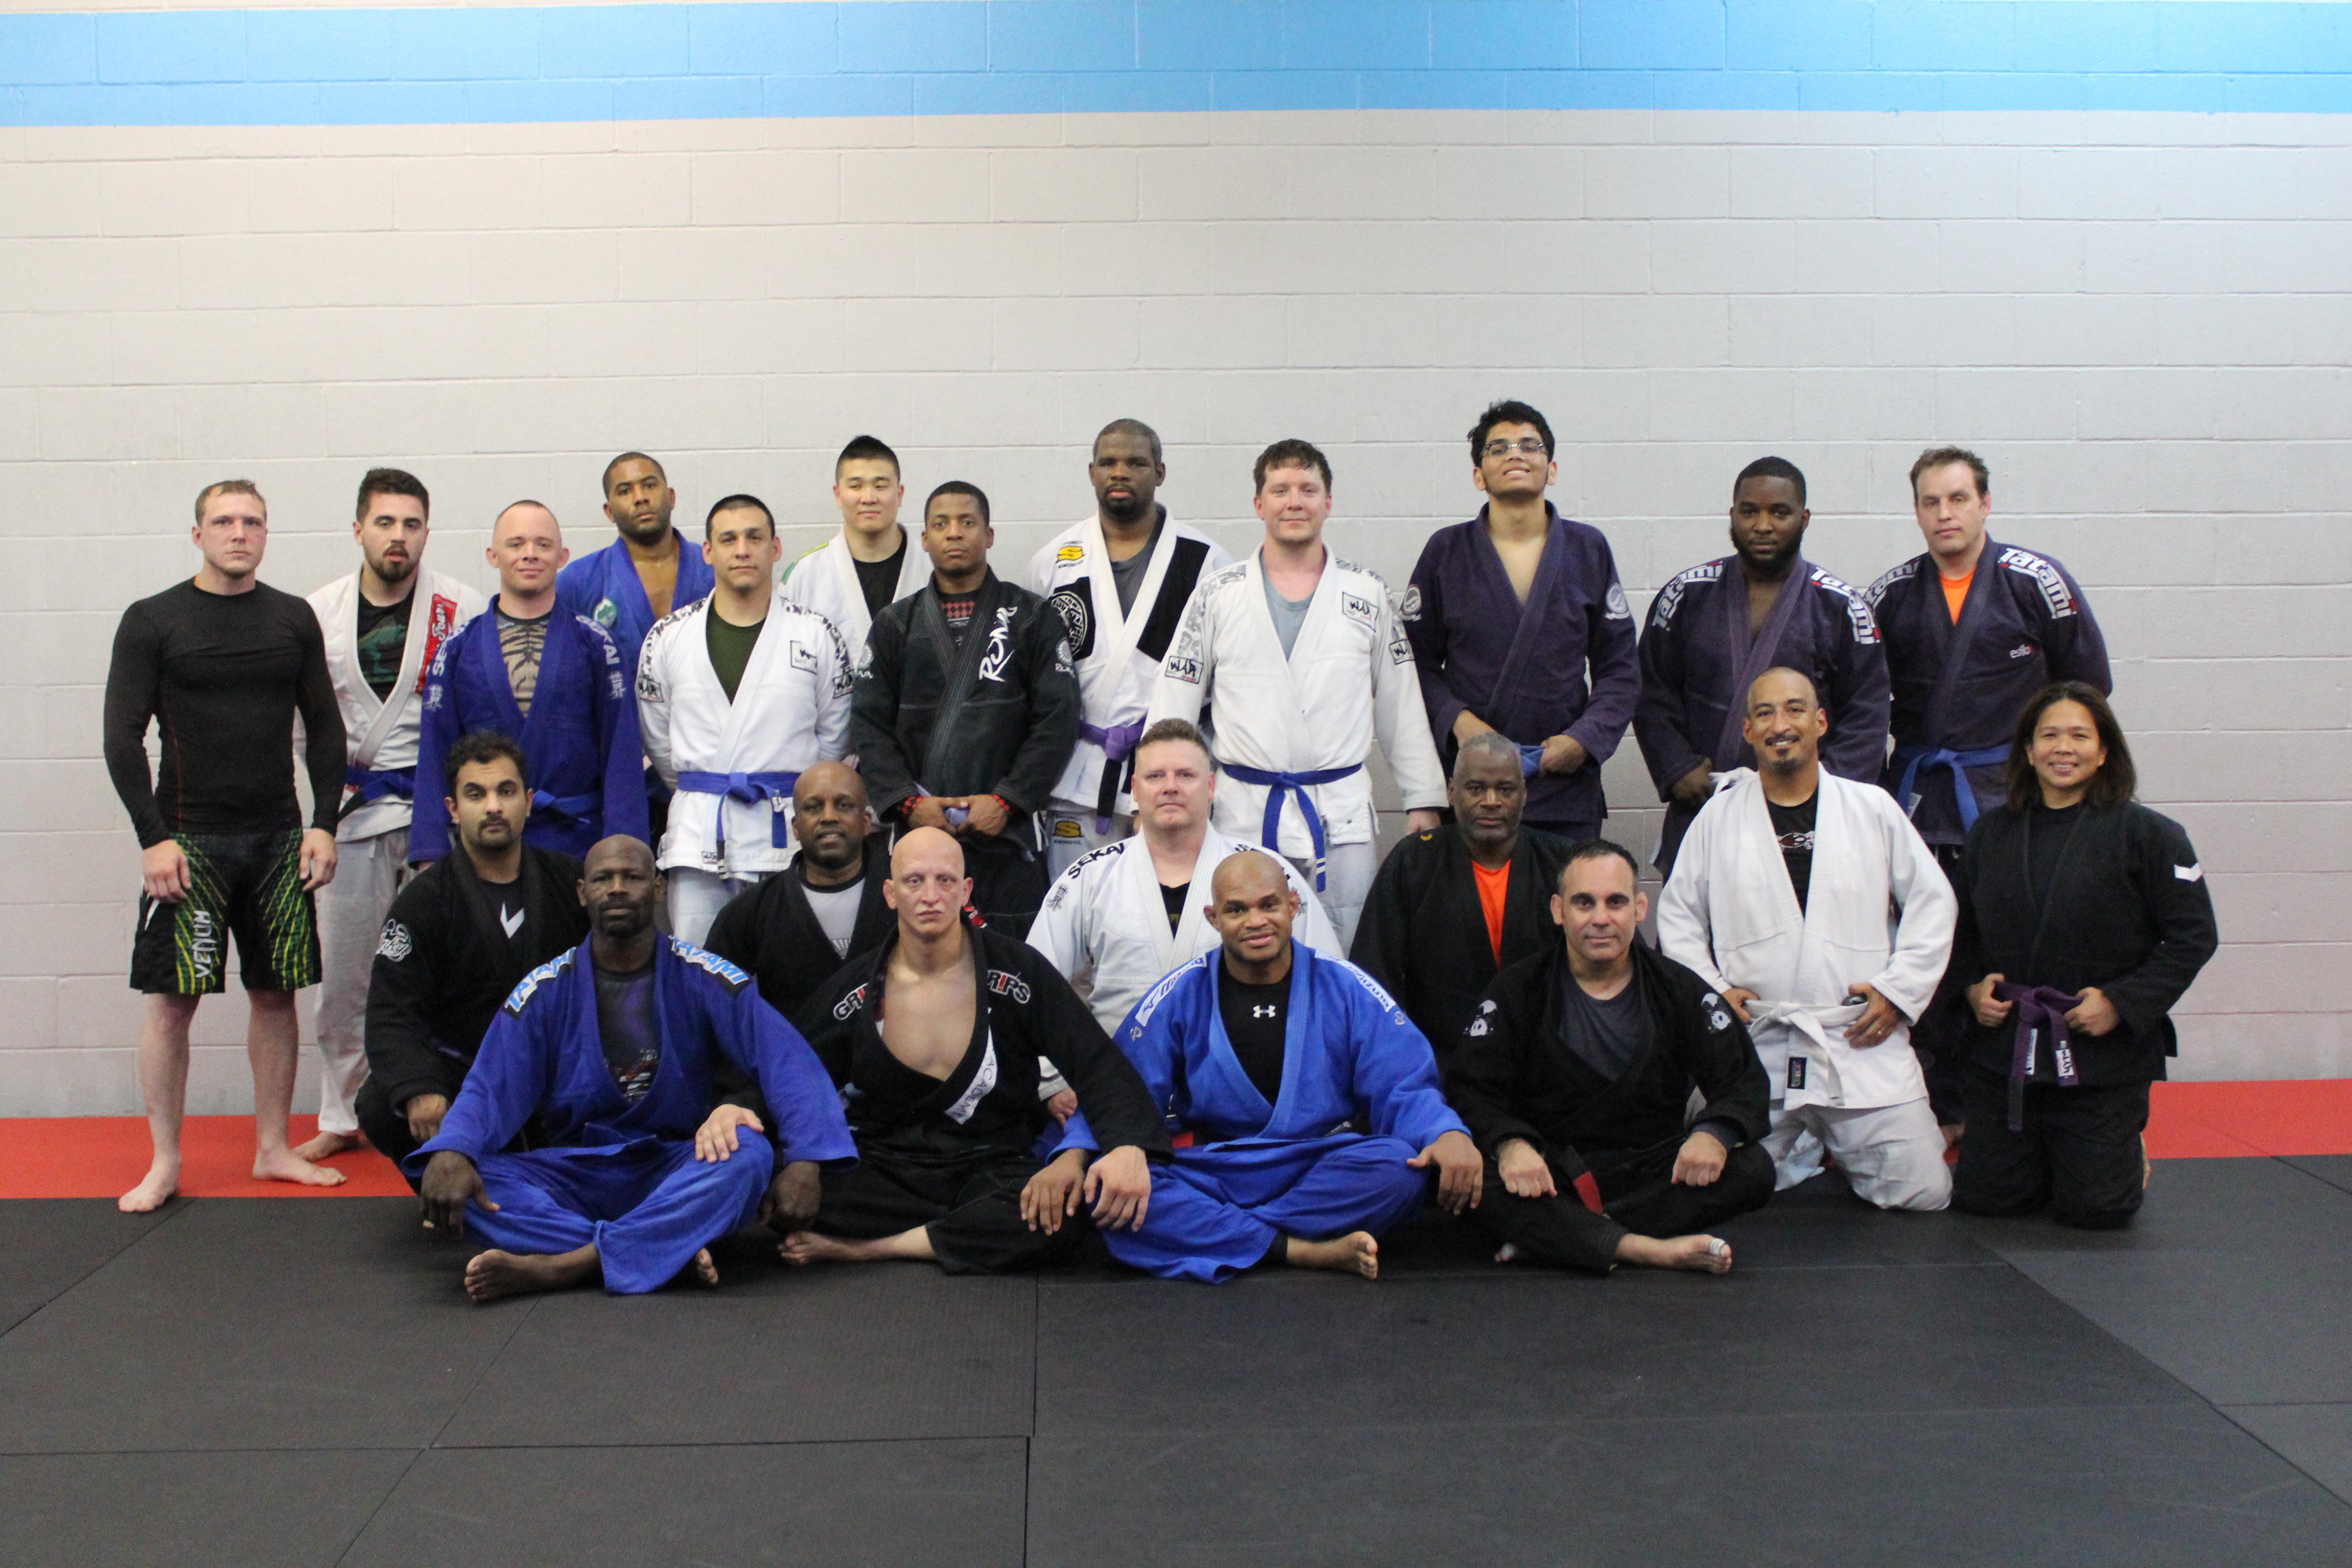 Testudo BJJ Judo Group